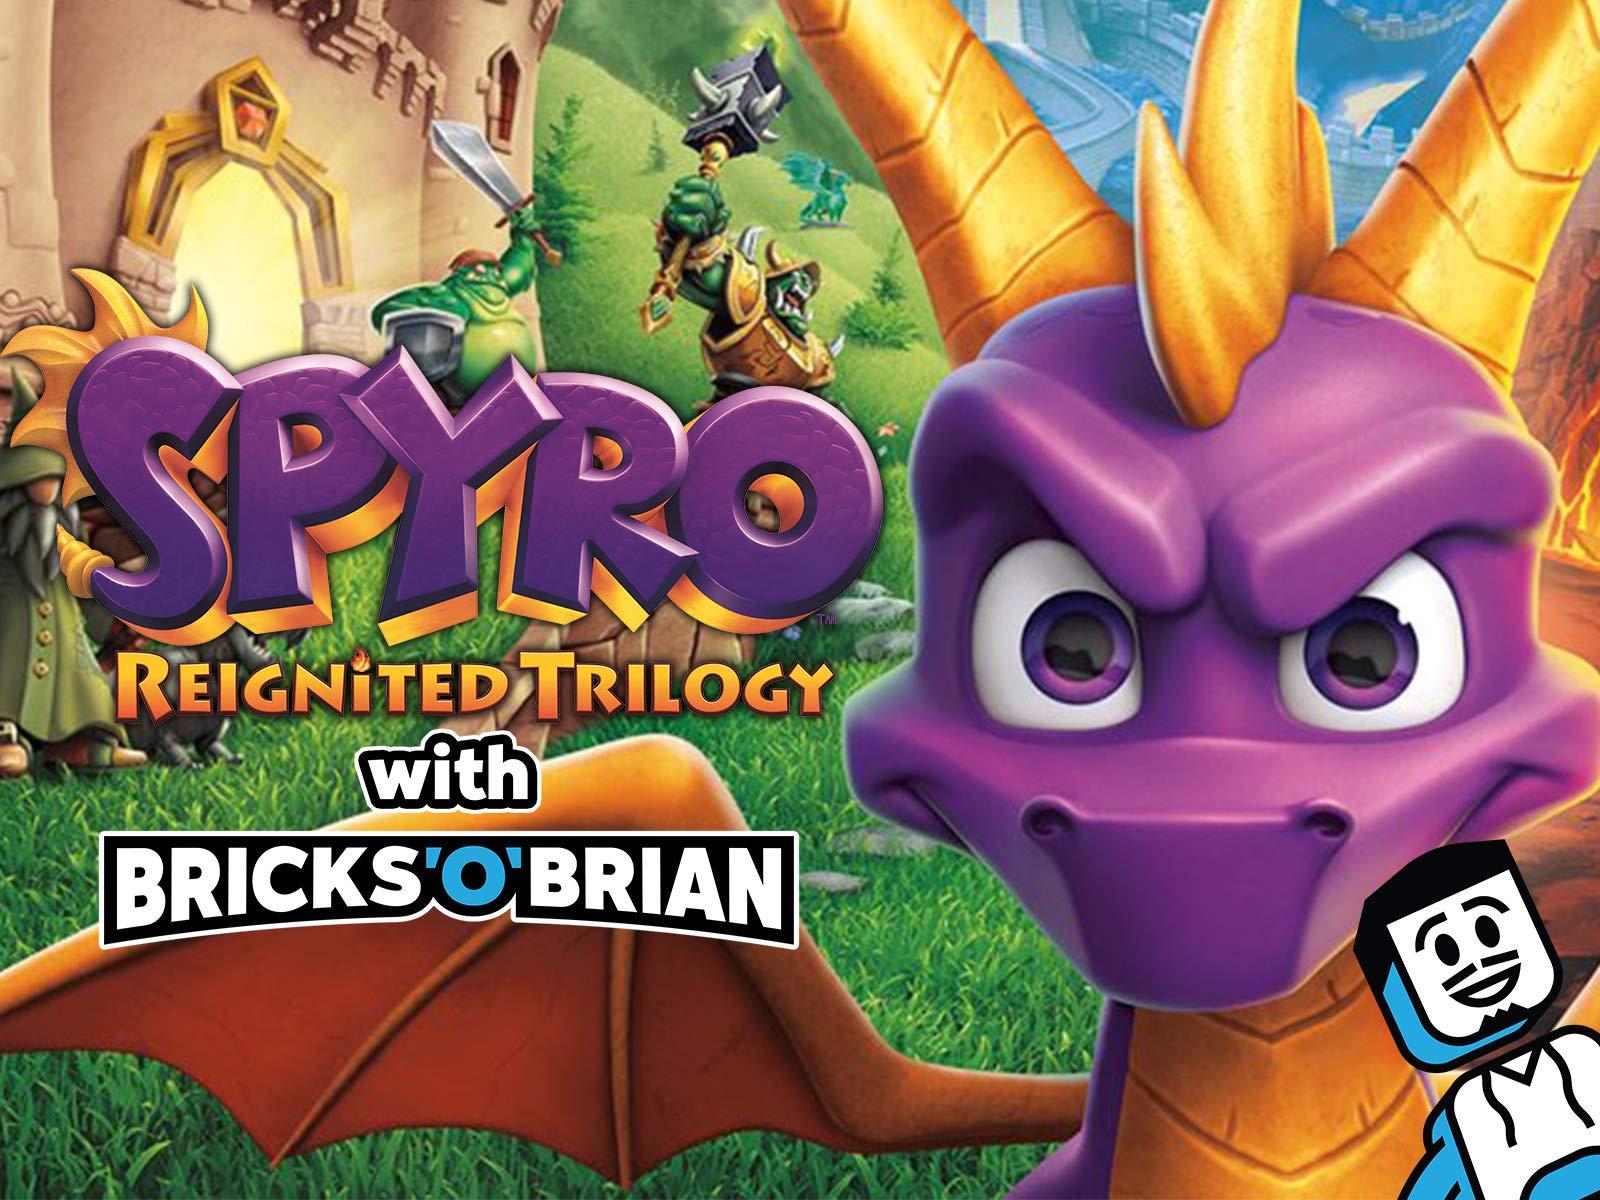 Clip: Spyro Reignited Trilogy with Bricks 'O' Brian! on Amazon Prime Video UK